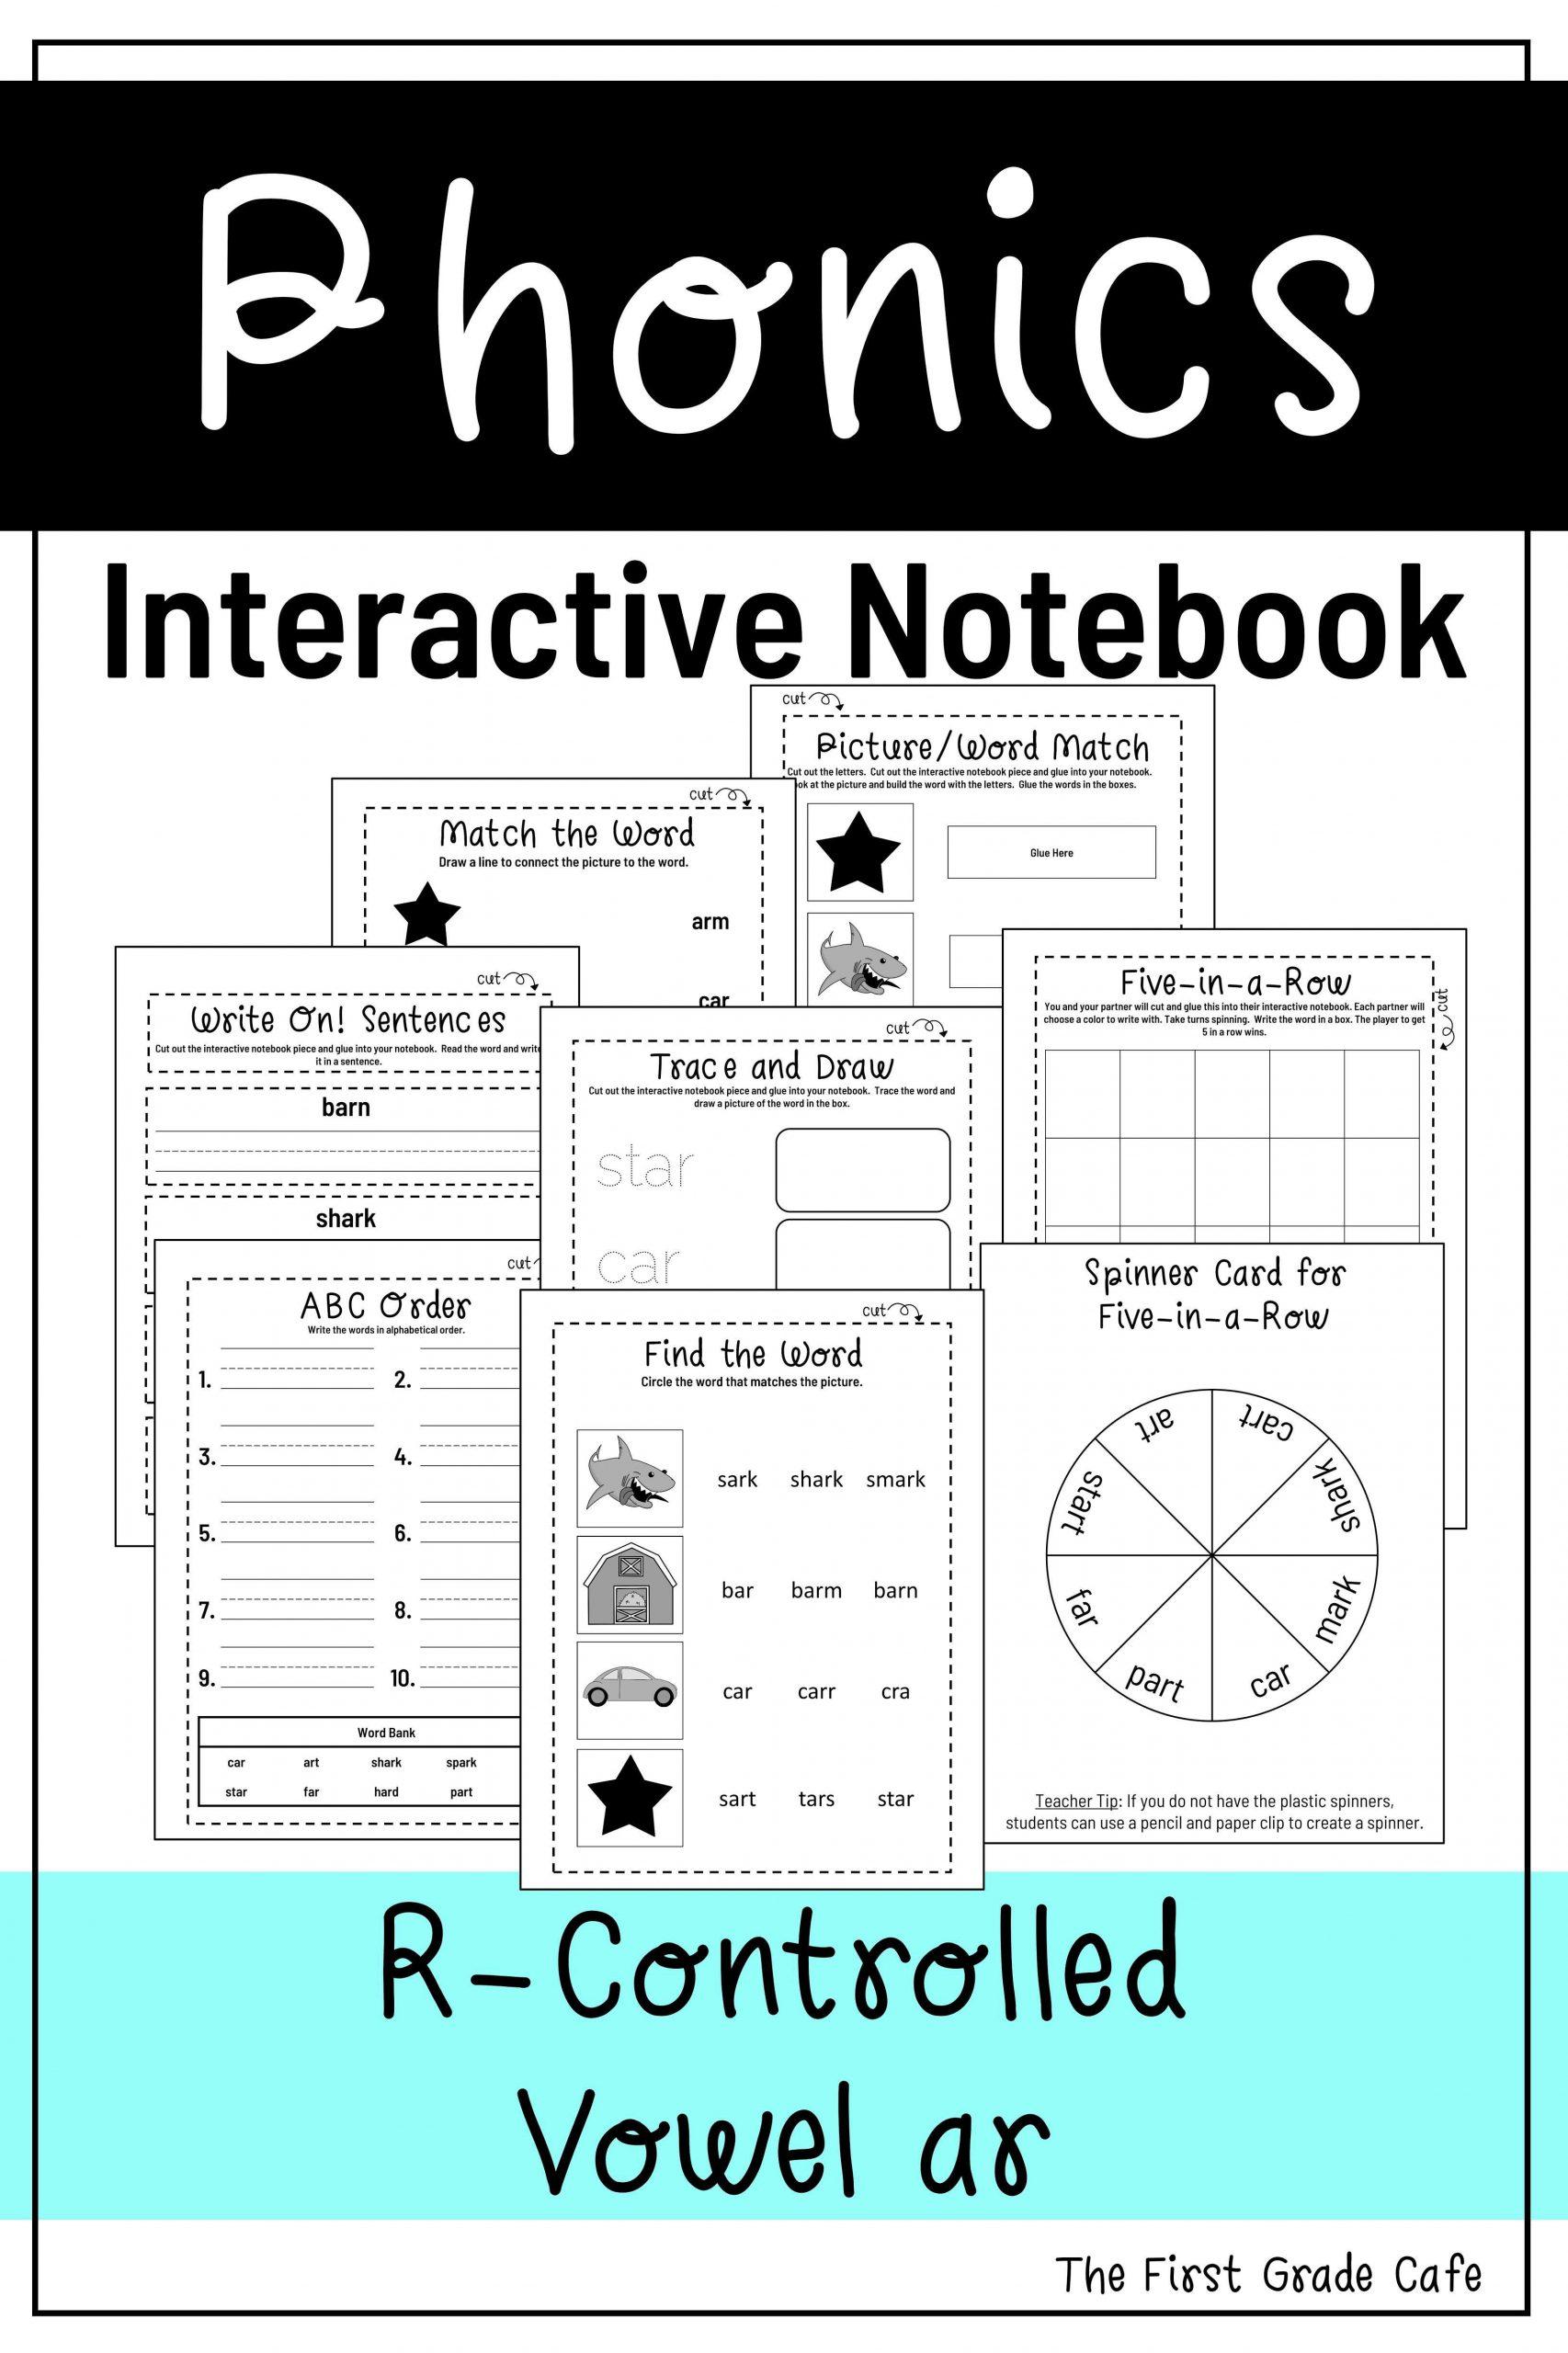 R Controlled Vowels Worksheet